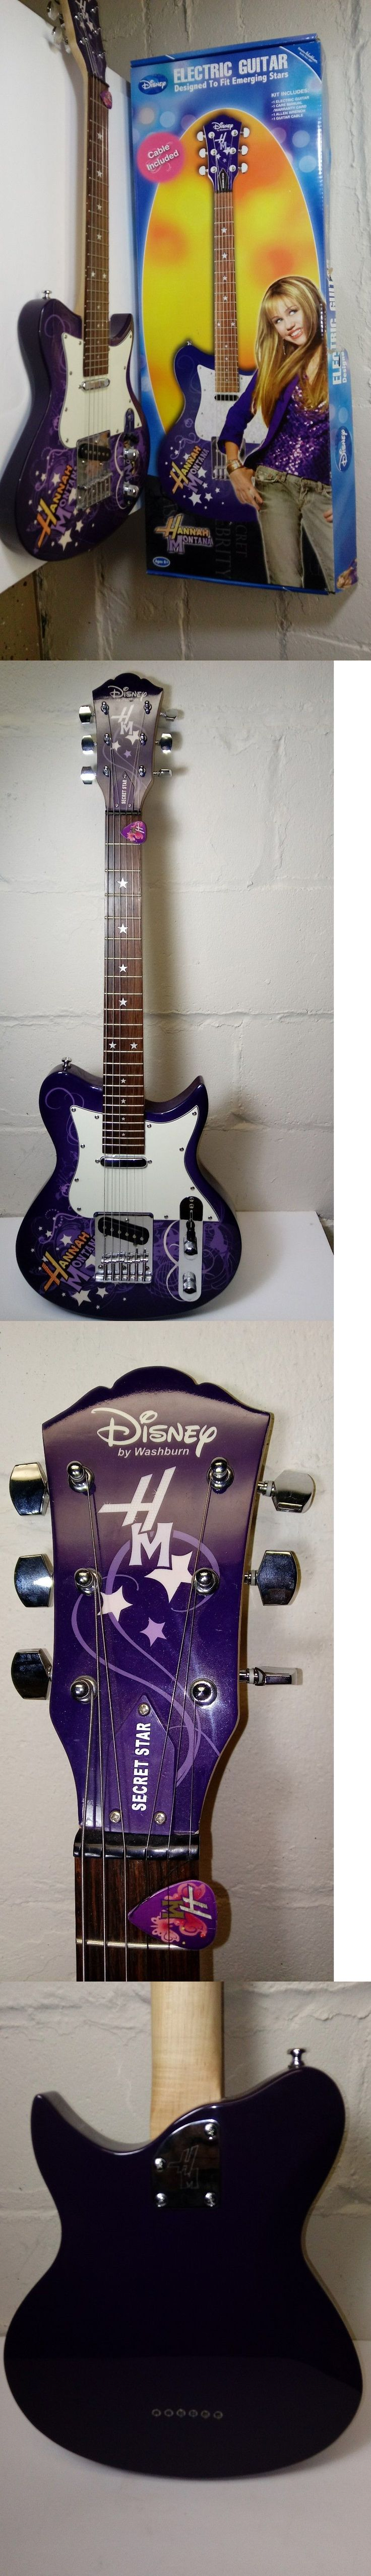 Hannah Montana 158763: Washburn Hannah Montana Electric Guitar Disney Hm Secret Star Pick Box 3 4 Sized -> BUY IT NOW ONLY: $99.95 on eBay!